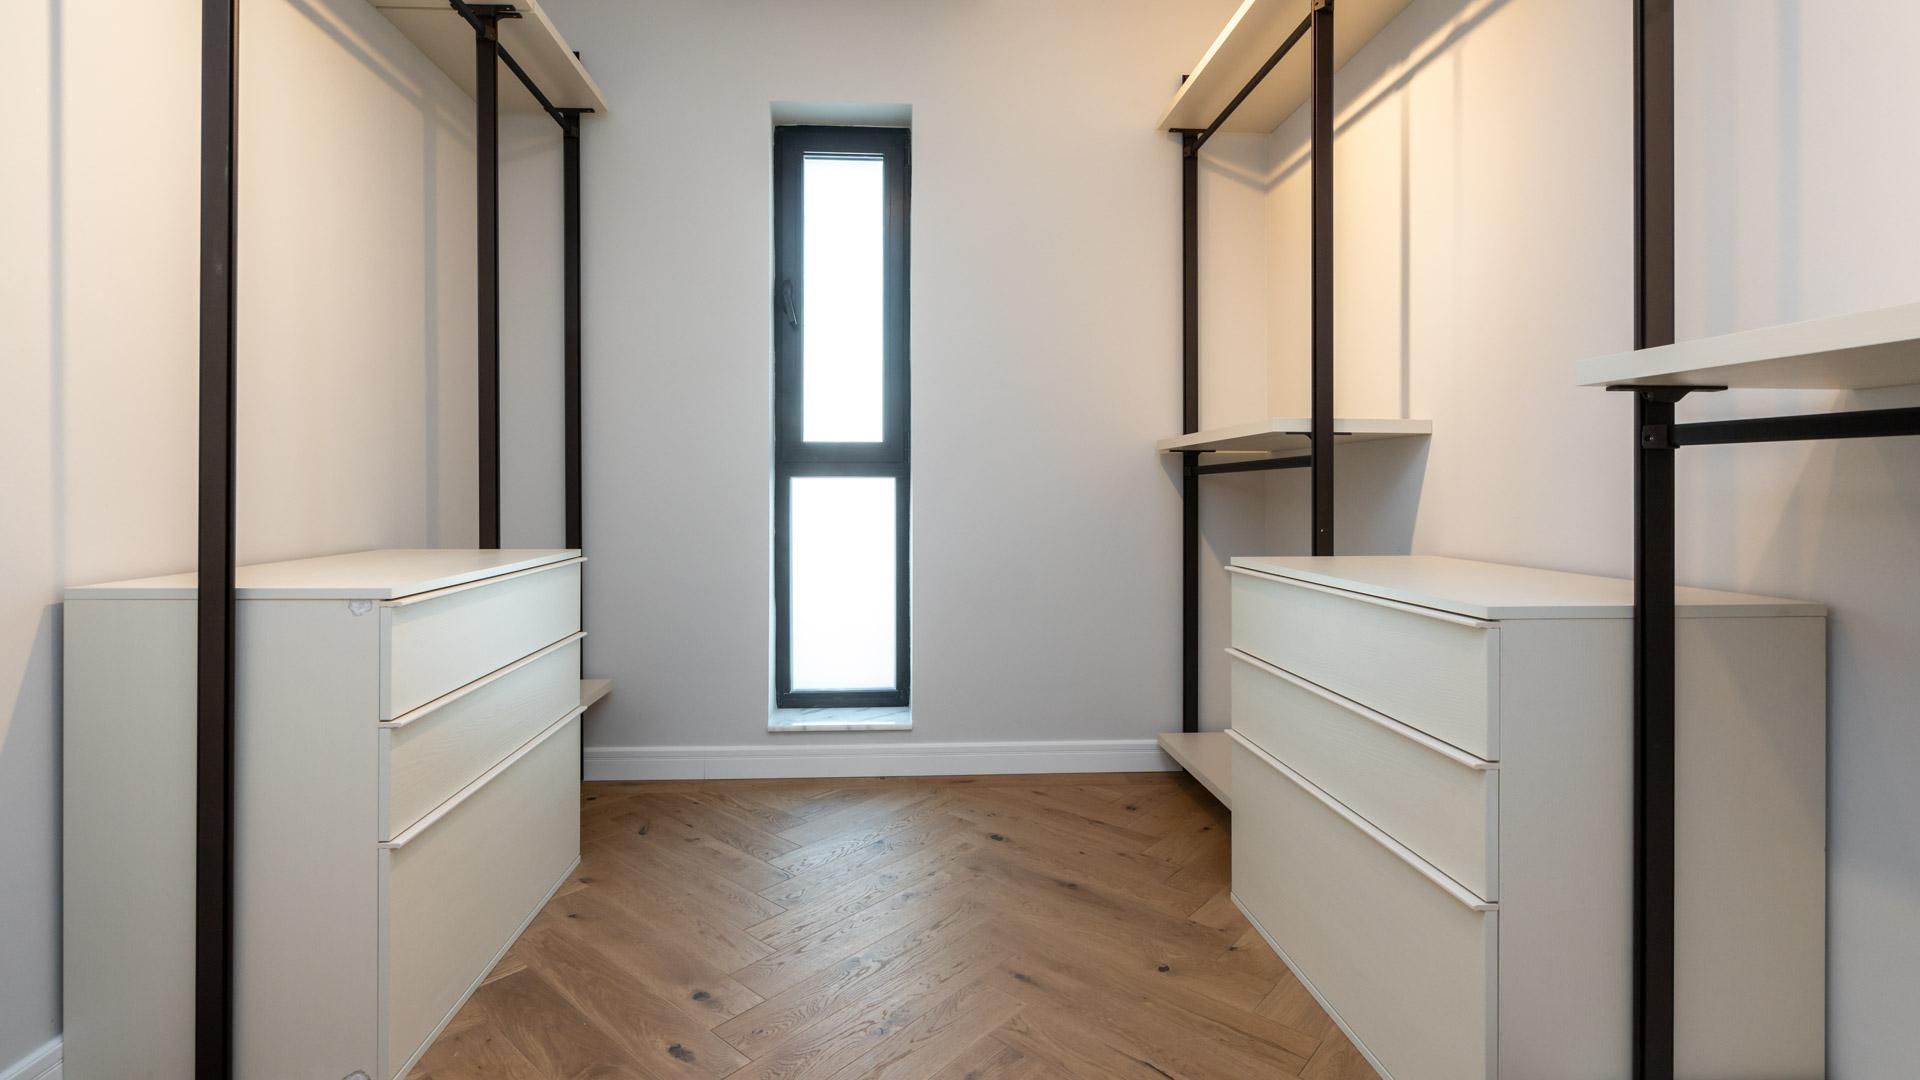 Northville-Baneasa-vila-showroom-storage-room